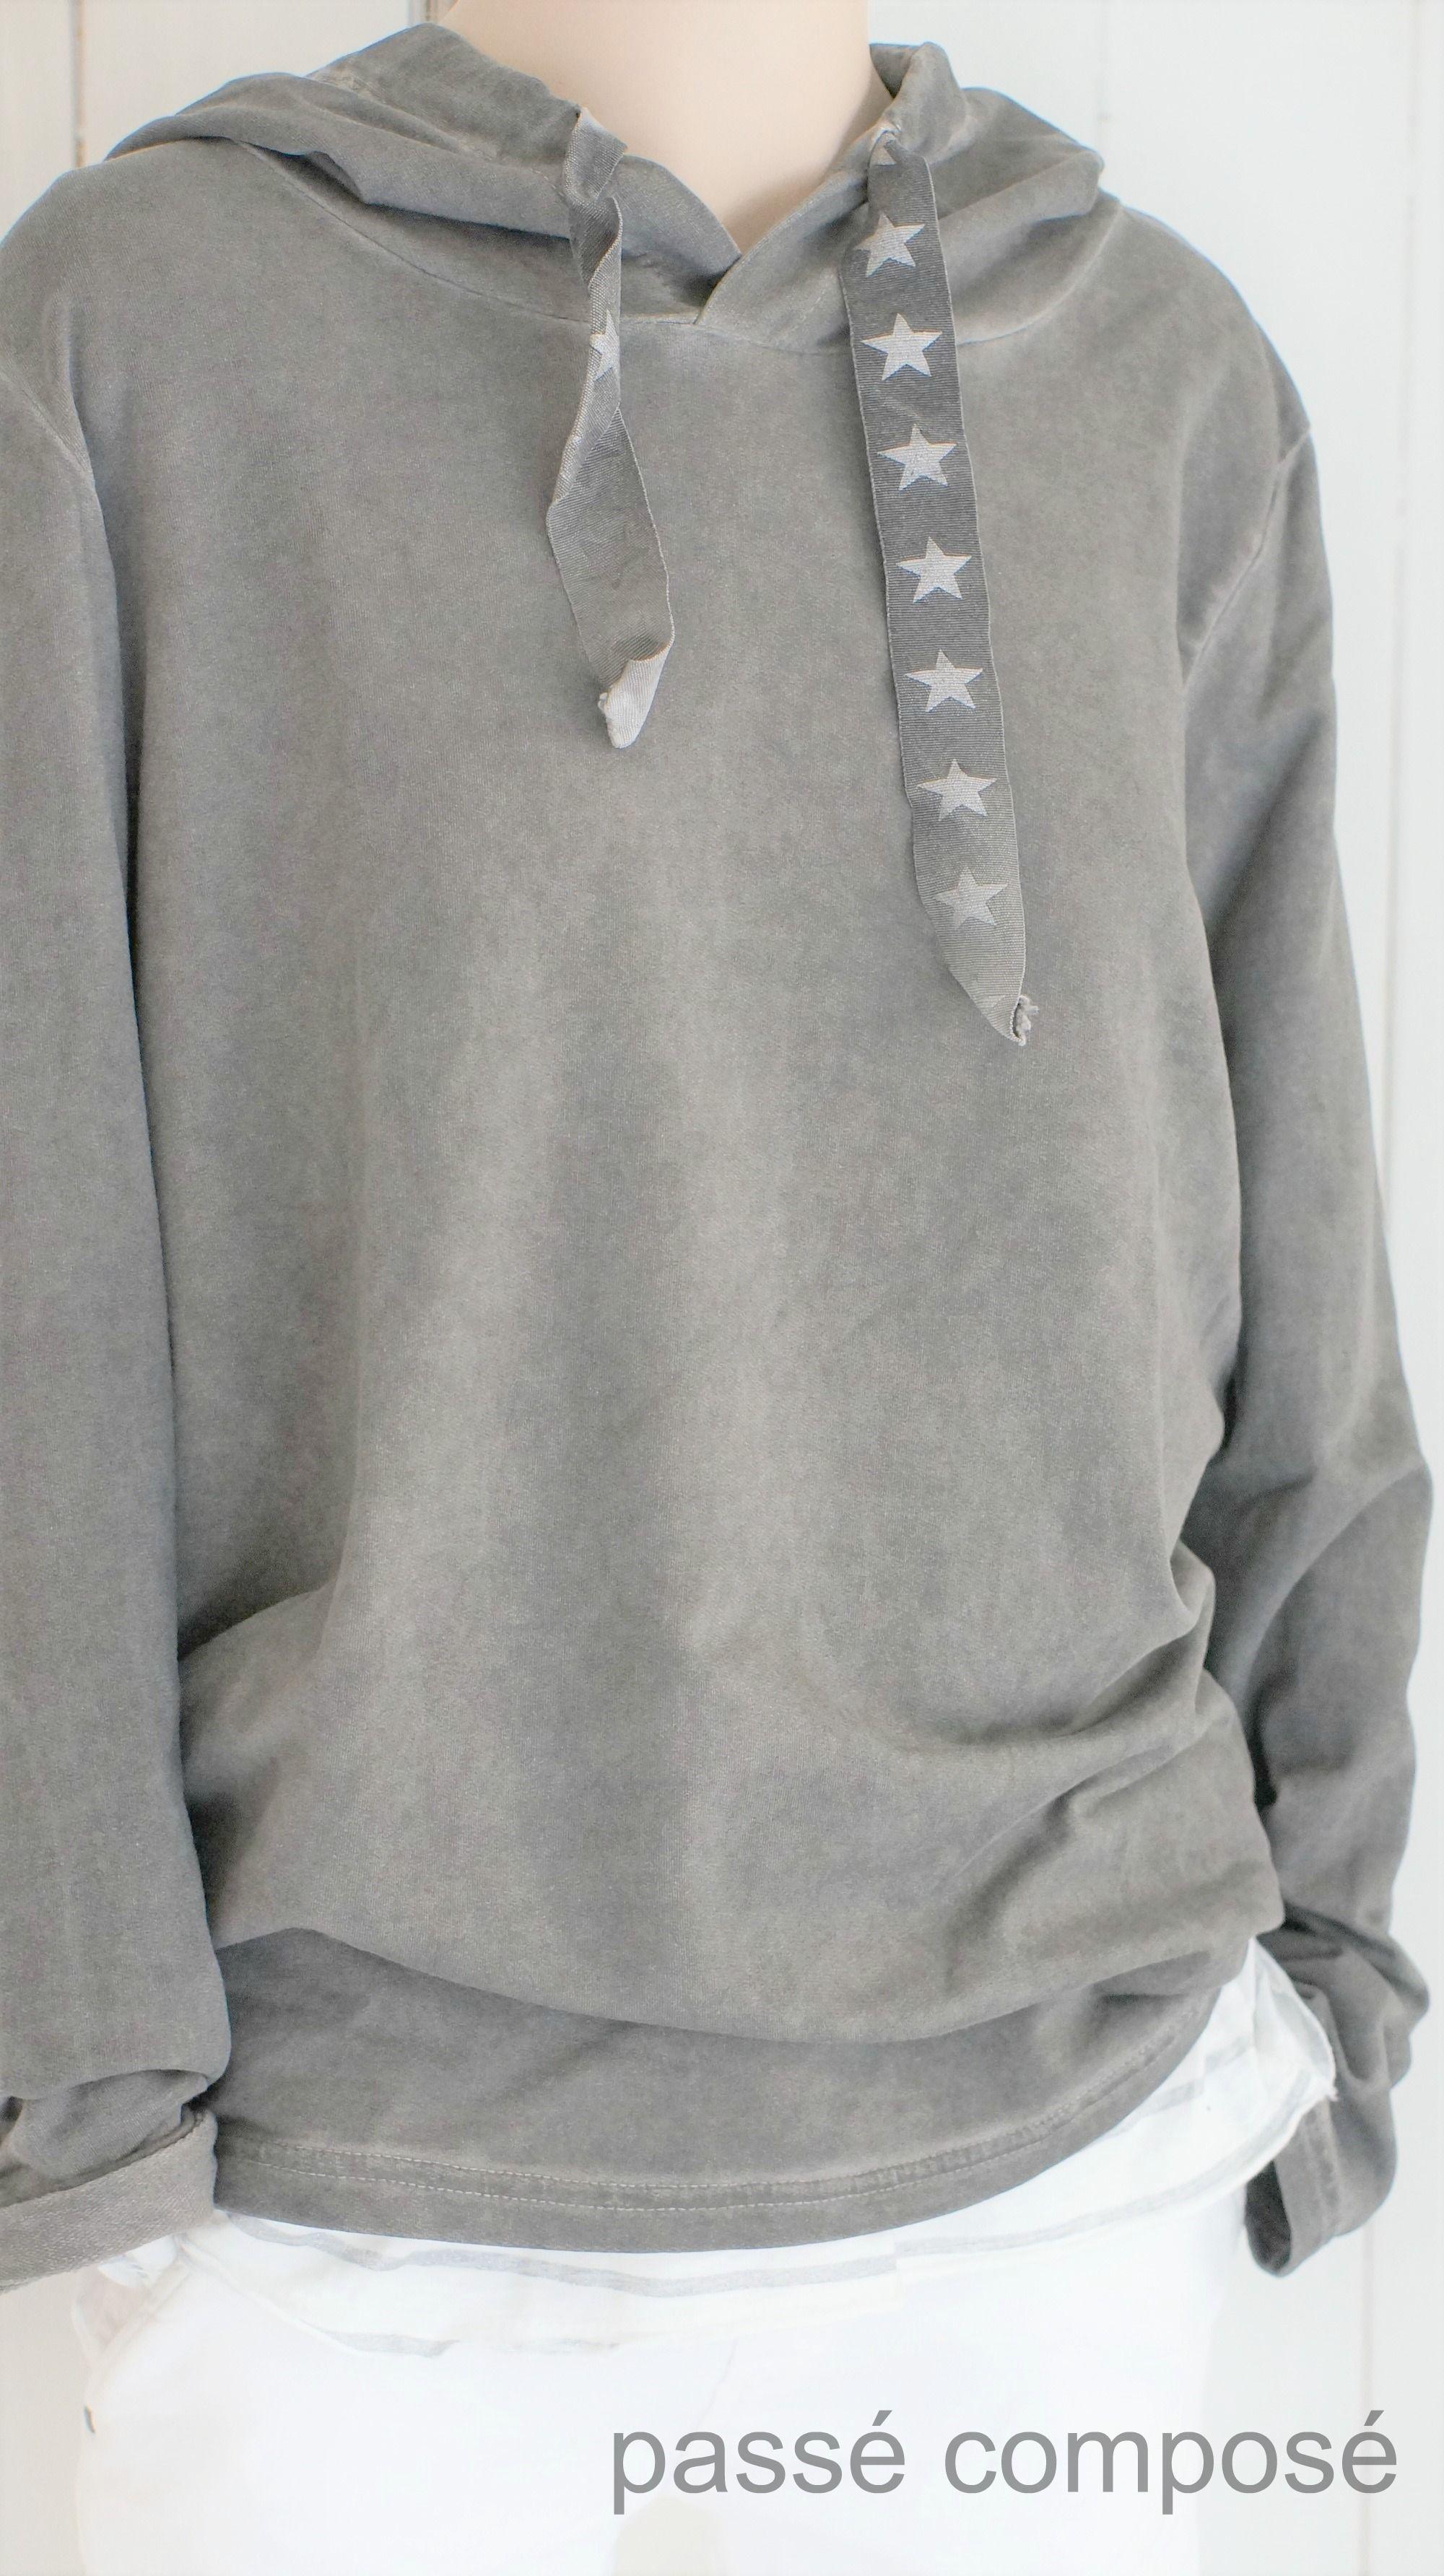 9a4e6b15f online store shopping BARCELONA | Fashion: Passé compose | Fashion ...